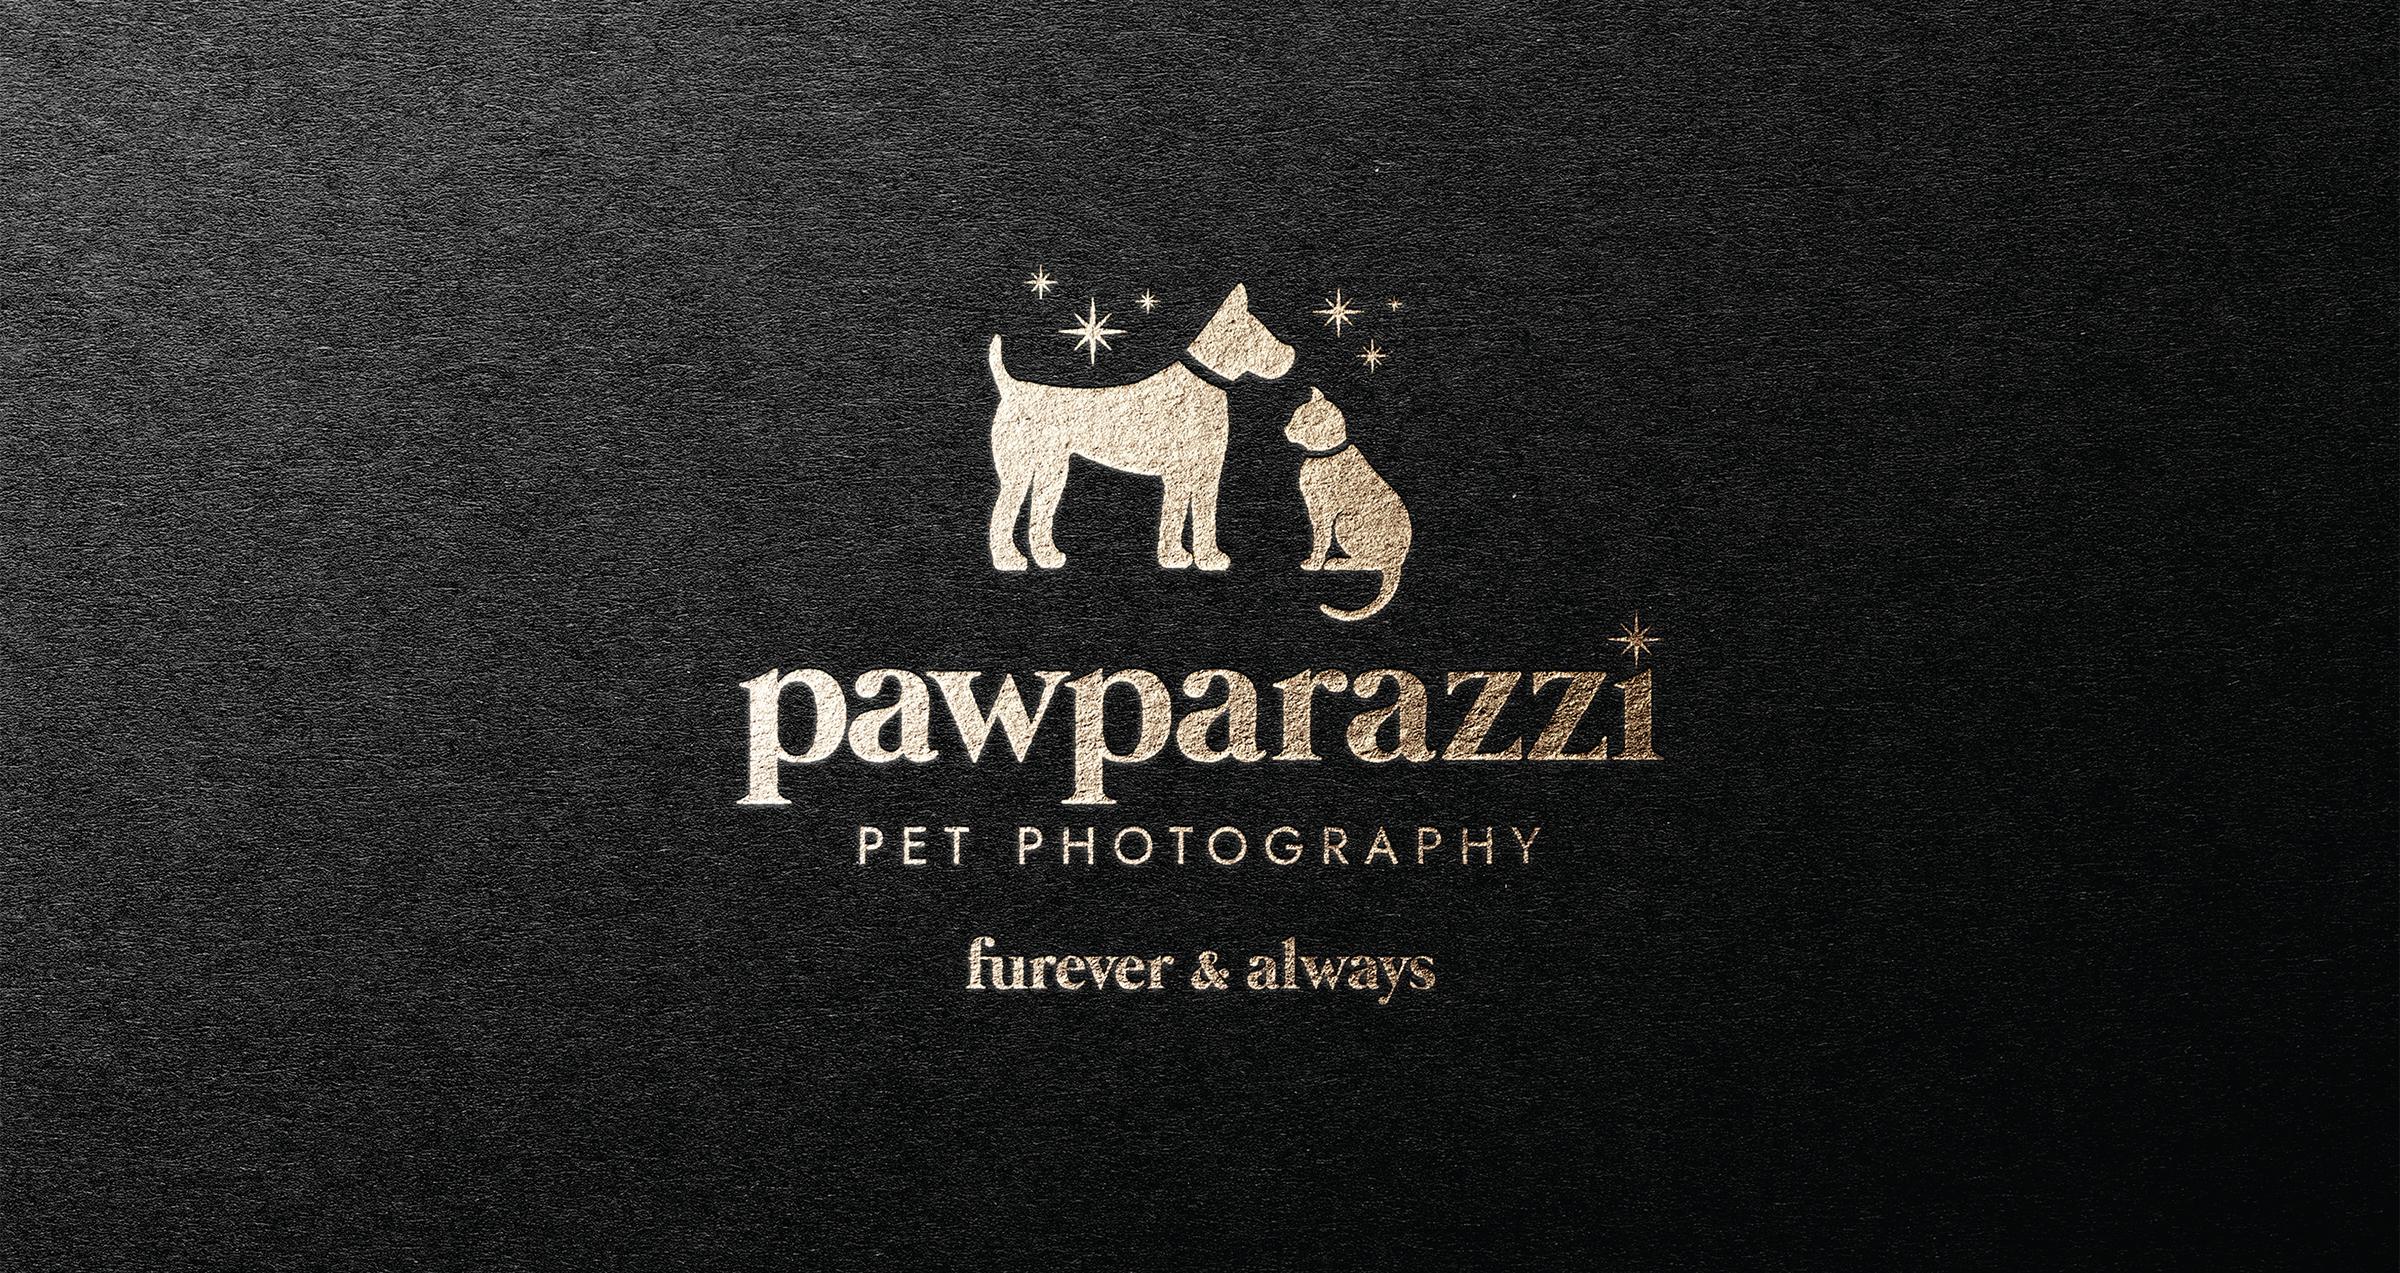 Pawparazzi Winnipeg Feminist Brands Website Design Feminist Entrepreneurs Brand Presentation Feature